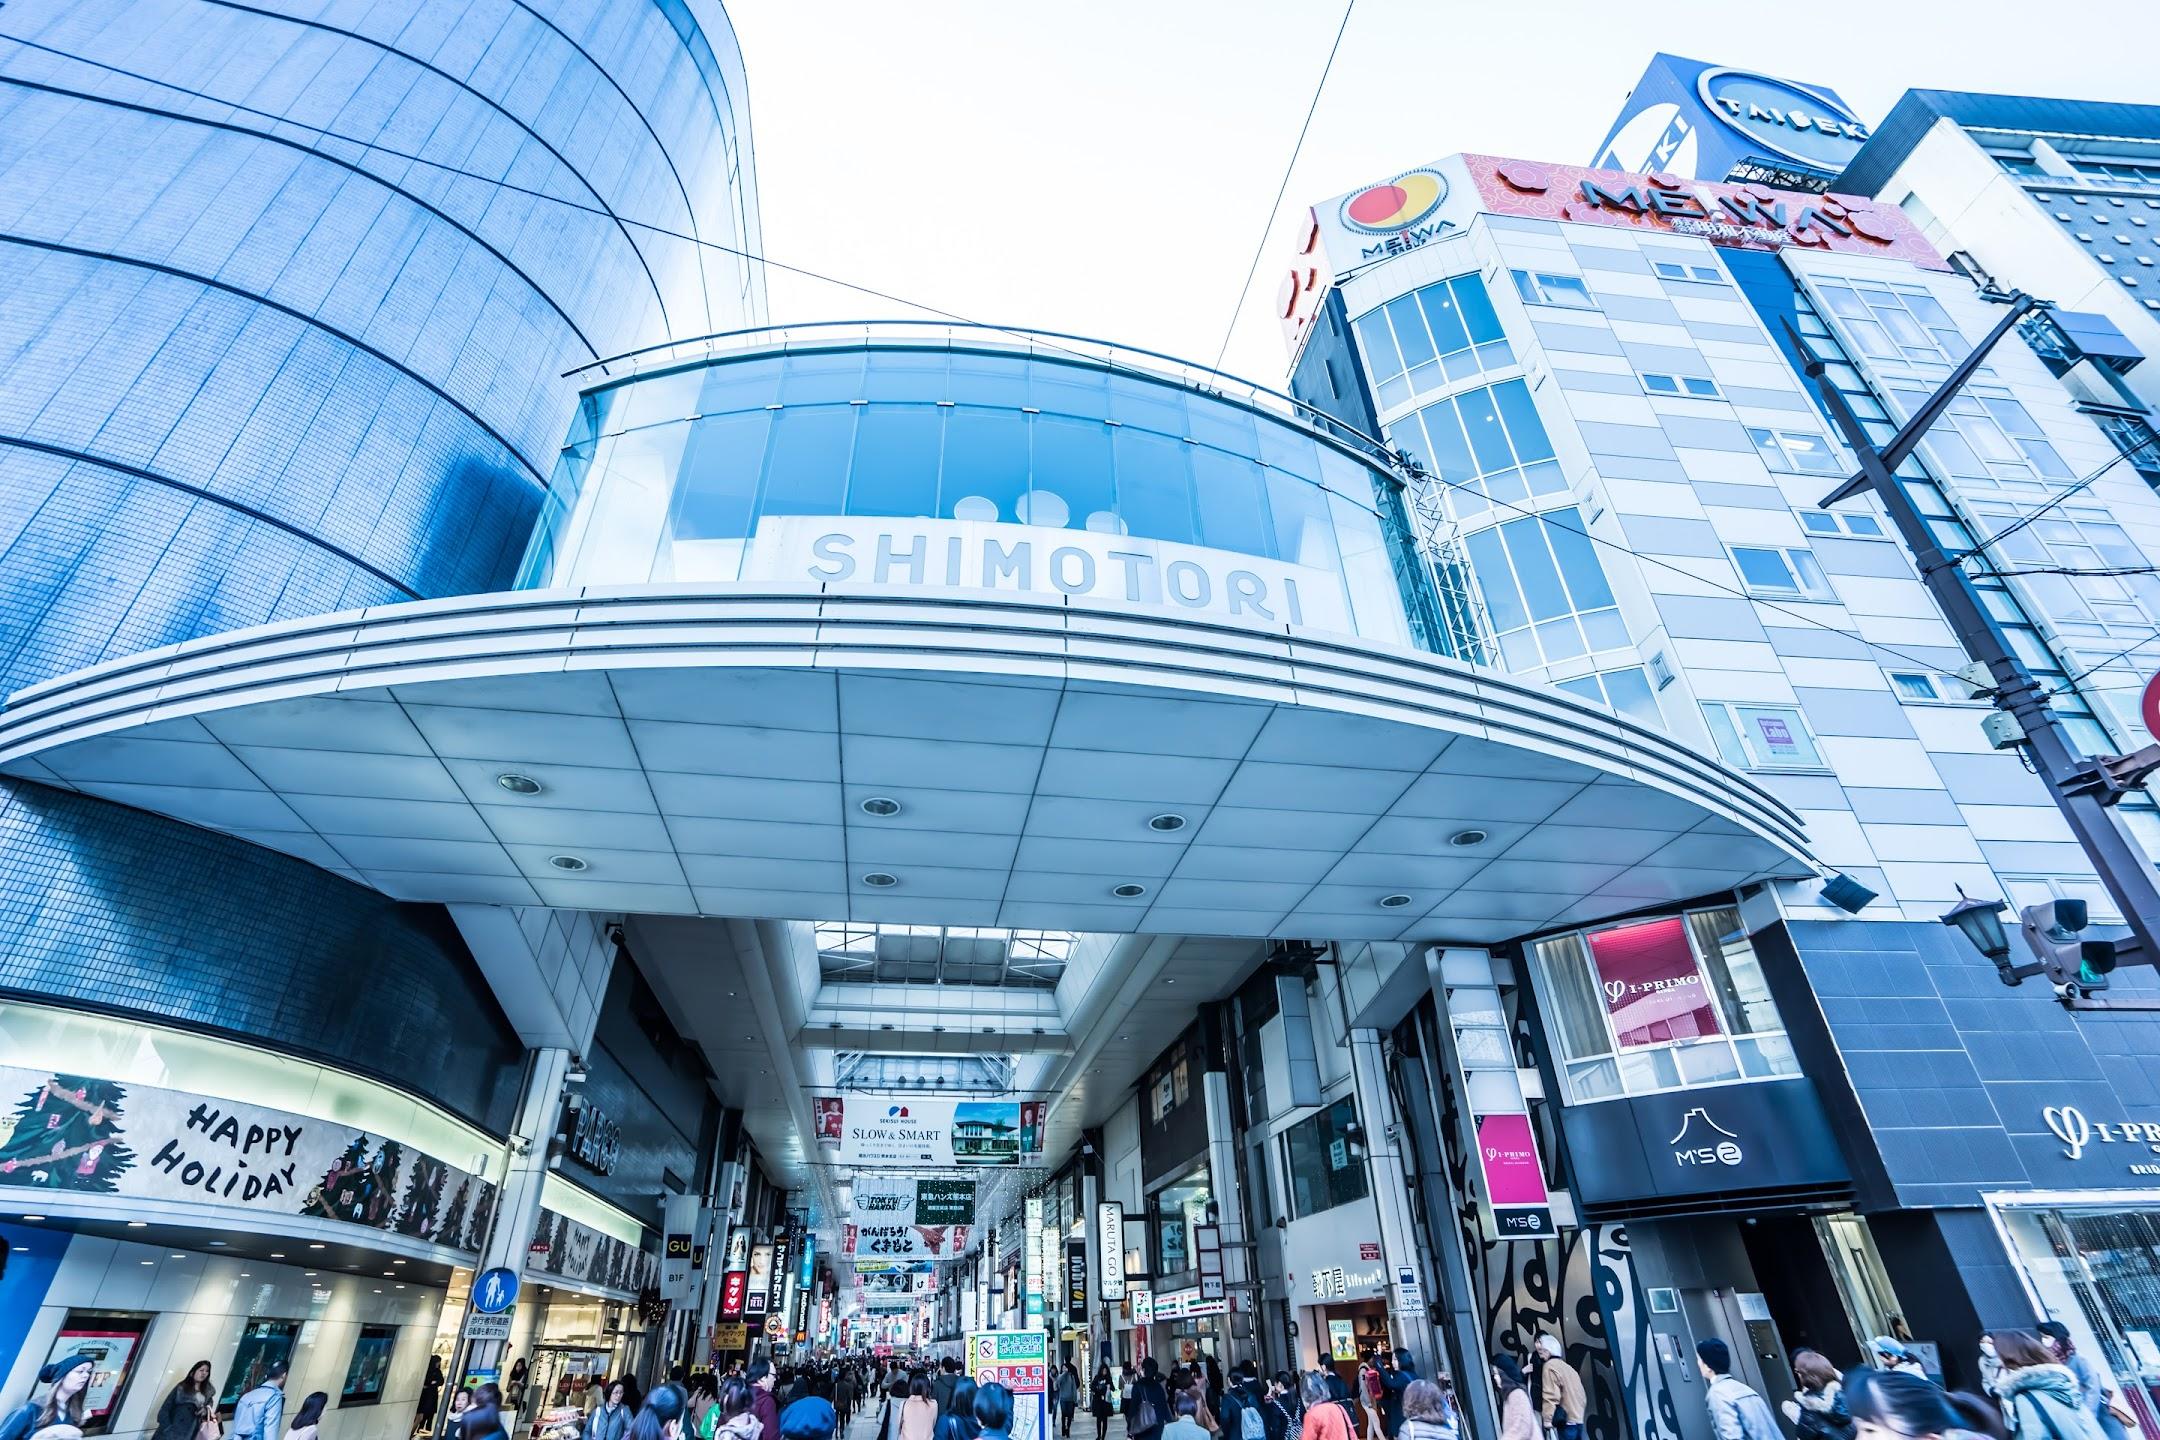 Kumamoto Shimotori Shopping Arcade1